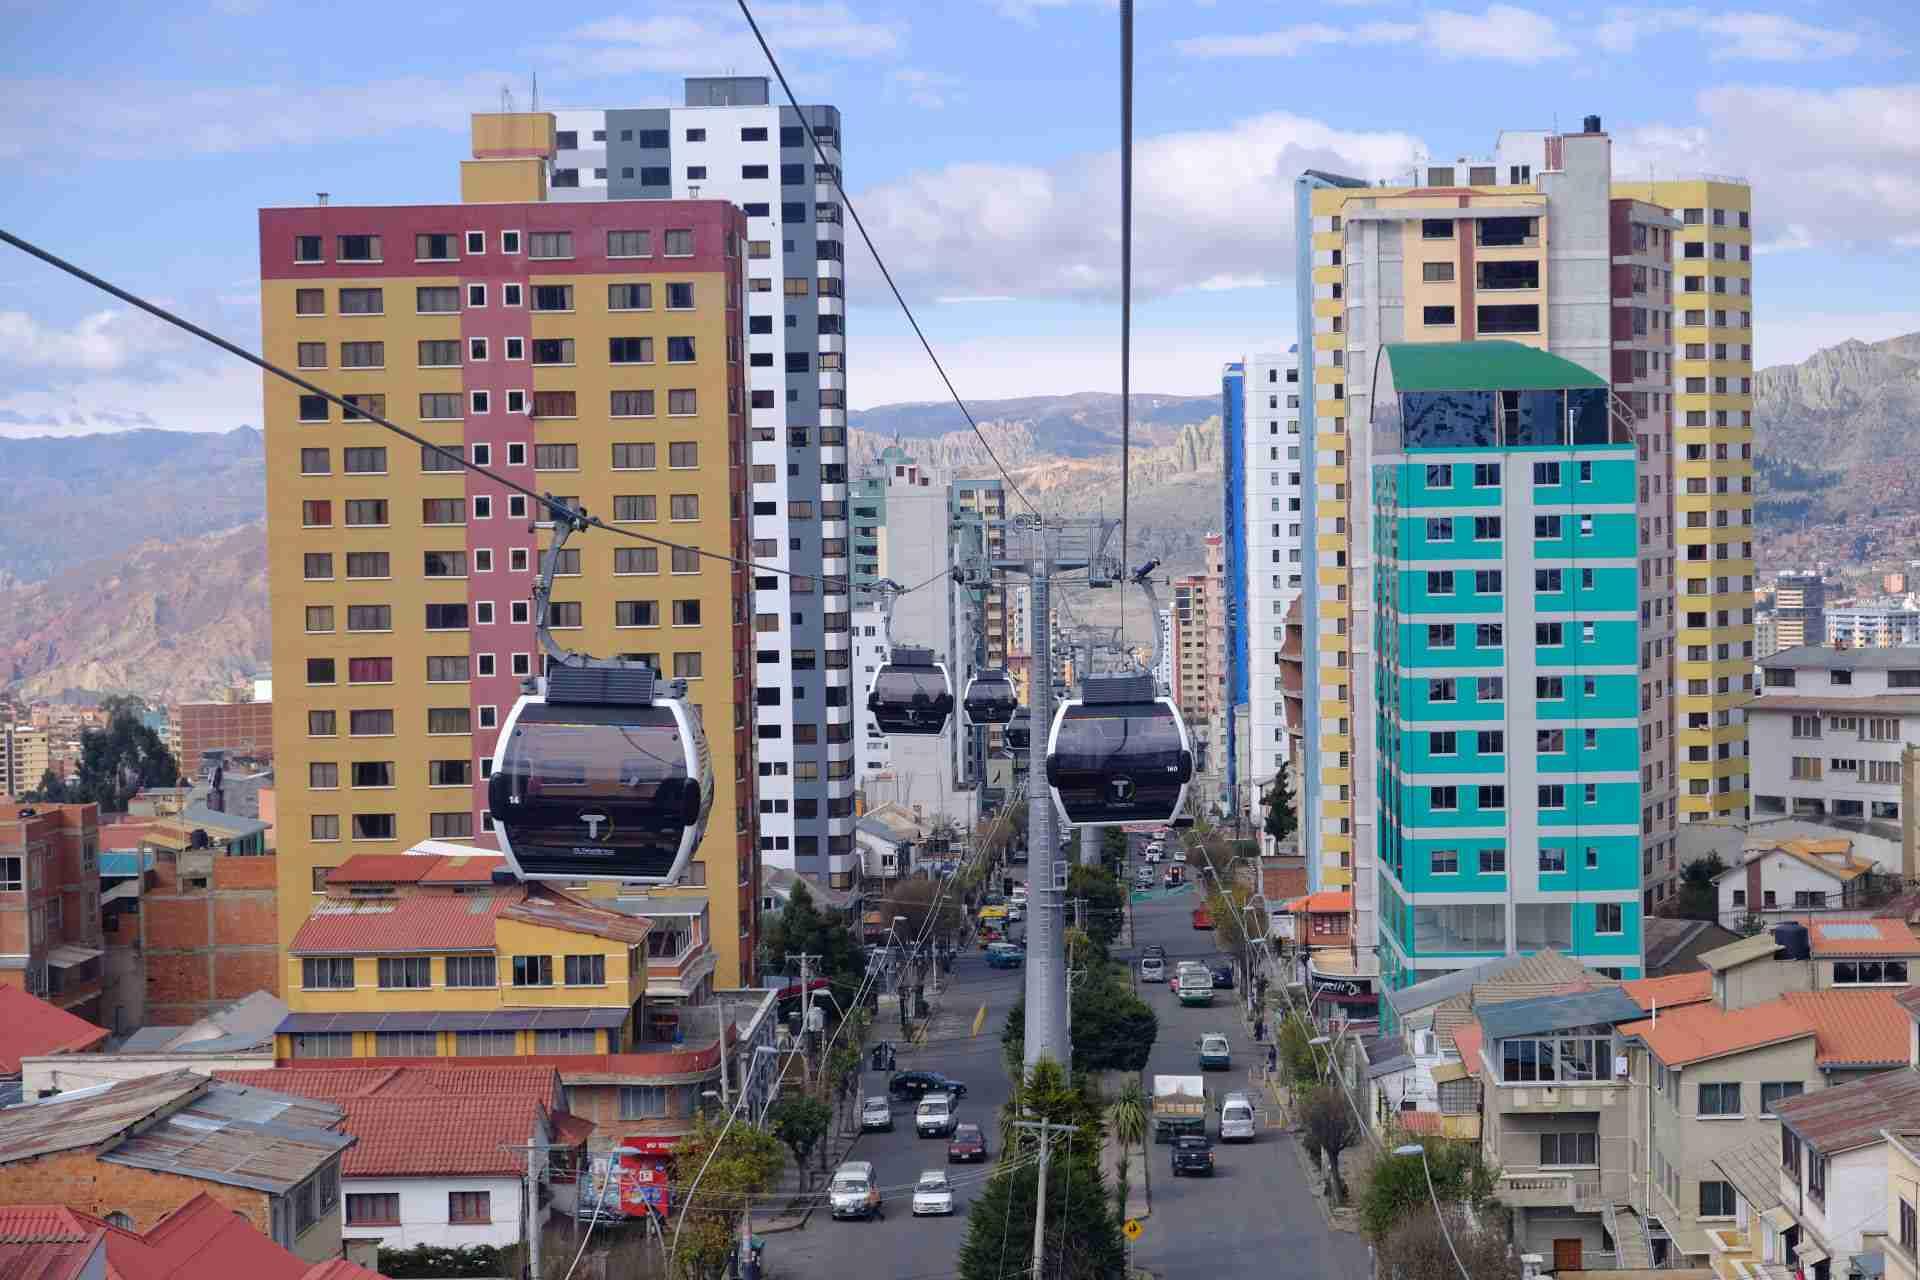 La Paz Cable Car System in Bolivia